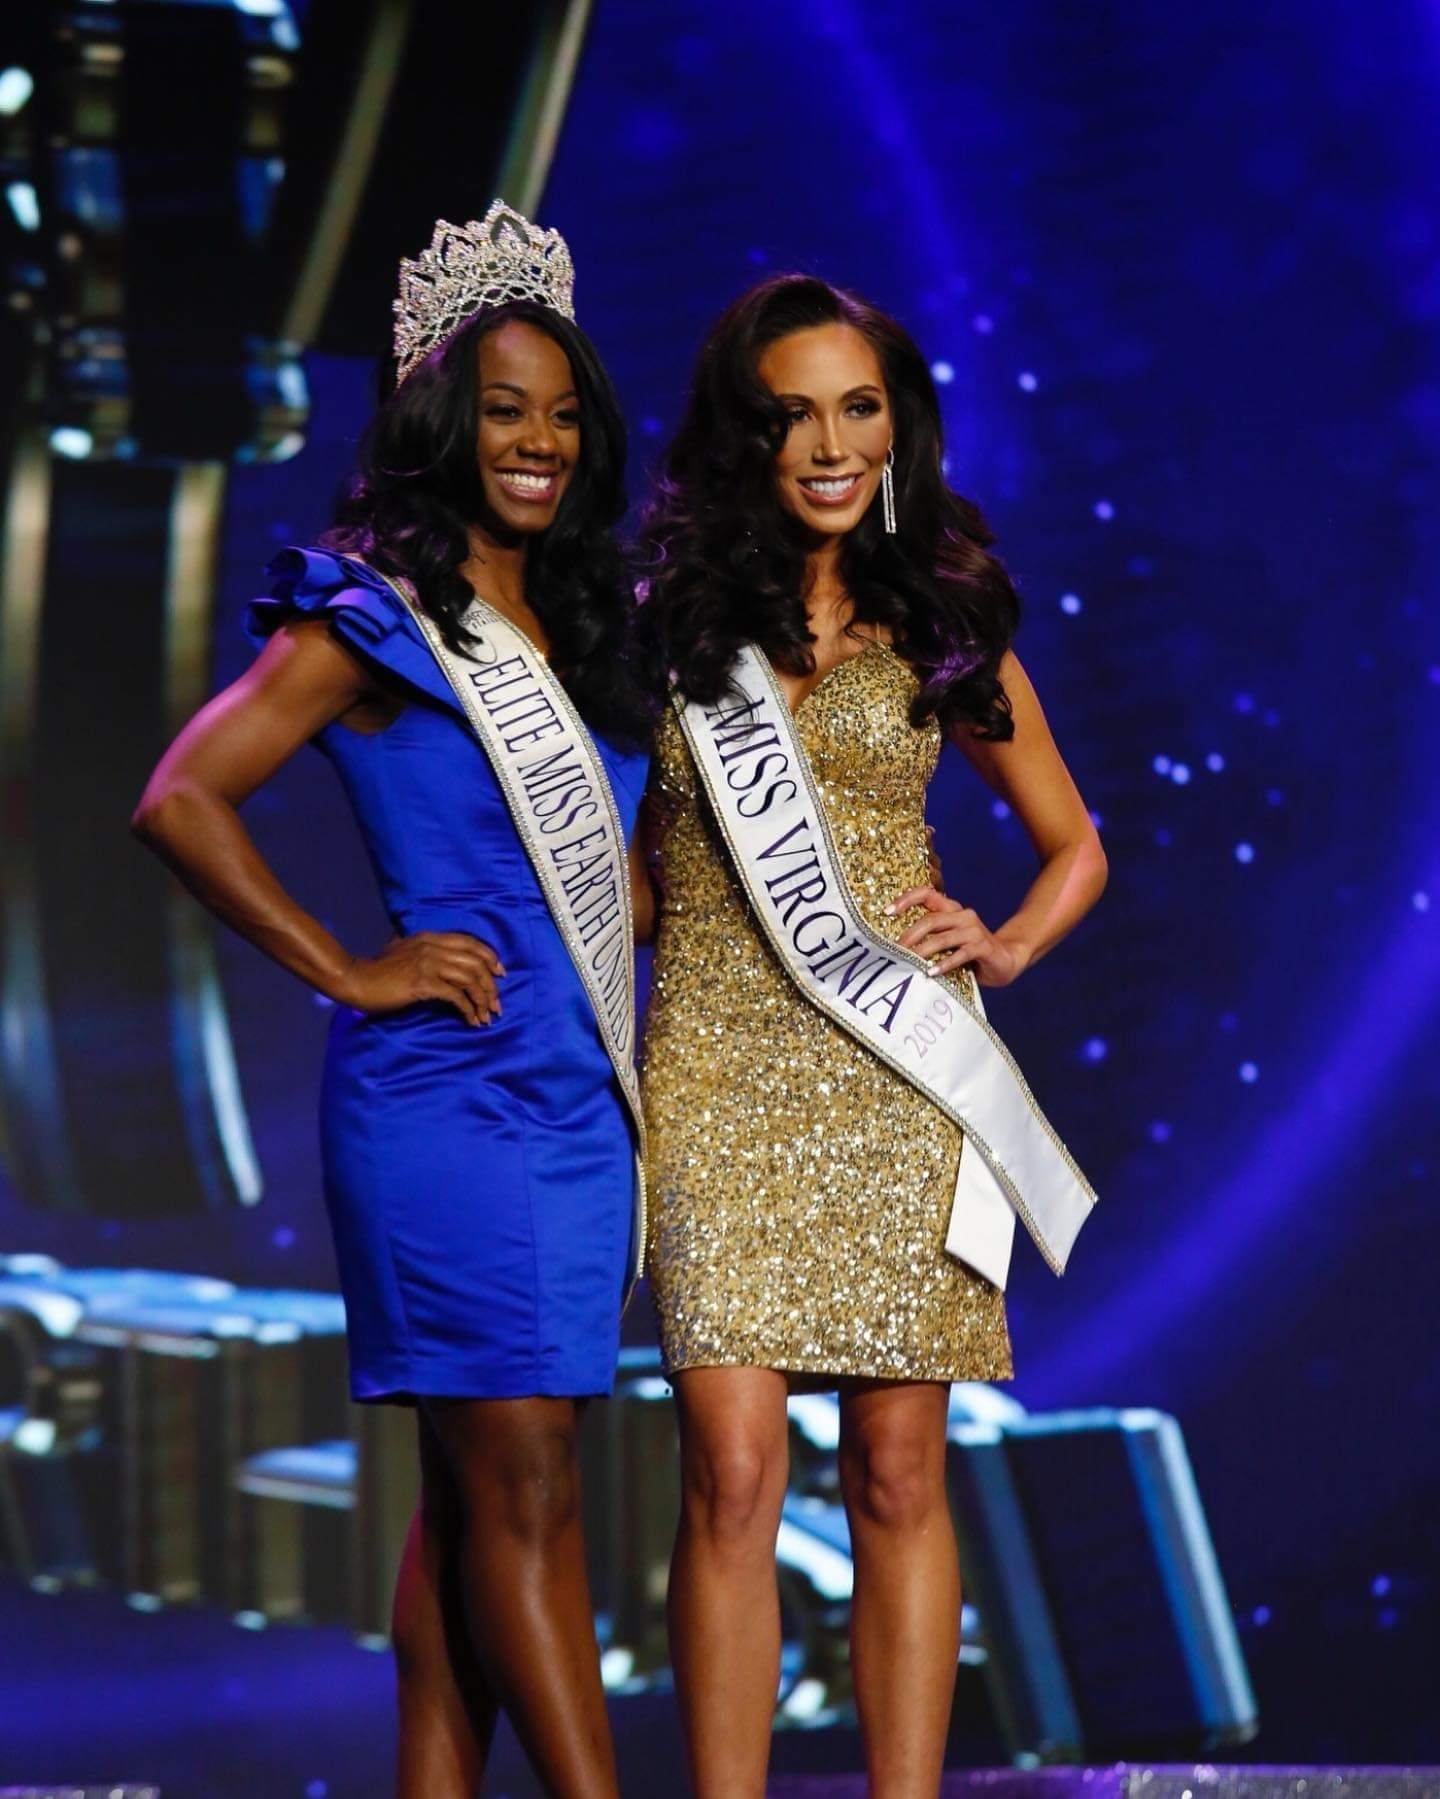 Tiffany Skiba-2019 Elite Miss VA